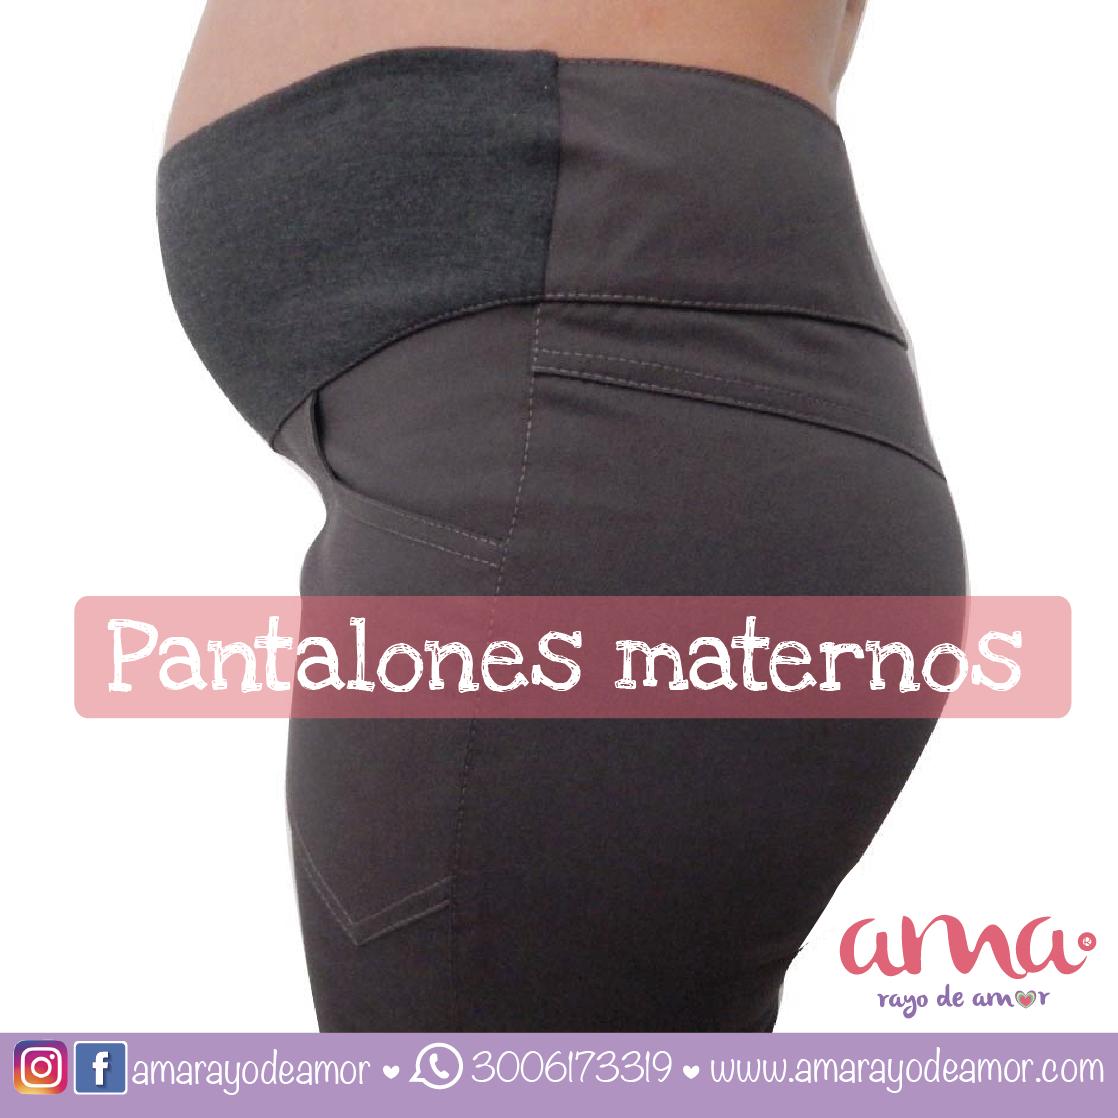 Pantalones Maternos Con Fajon Suave Para No Maltratar Tu Barriguita Cel Whatsapp 57 3006173319 Lactanciamaterna Ropala Fashion Pencil Skirt Maternity